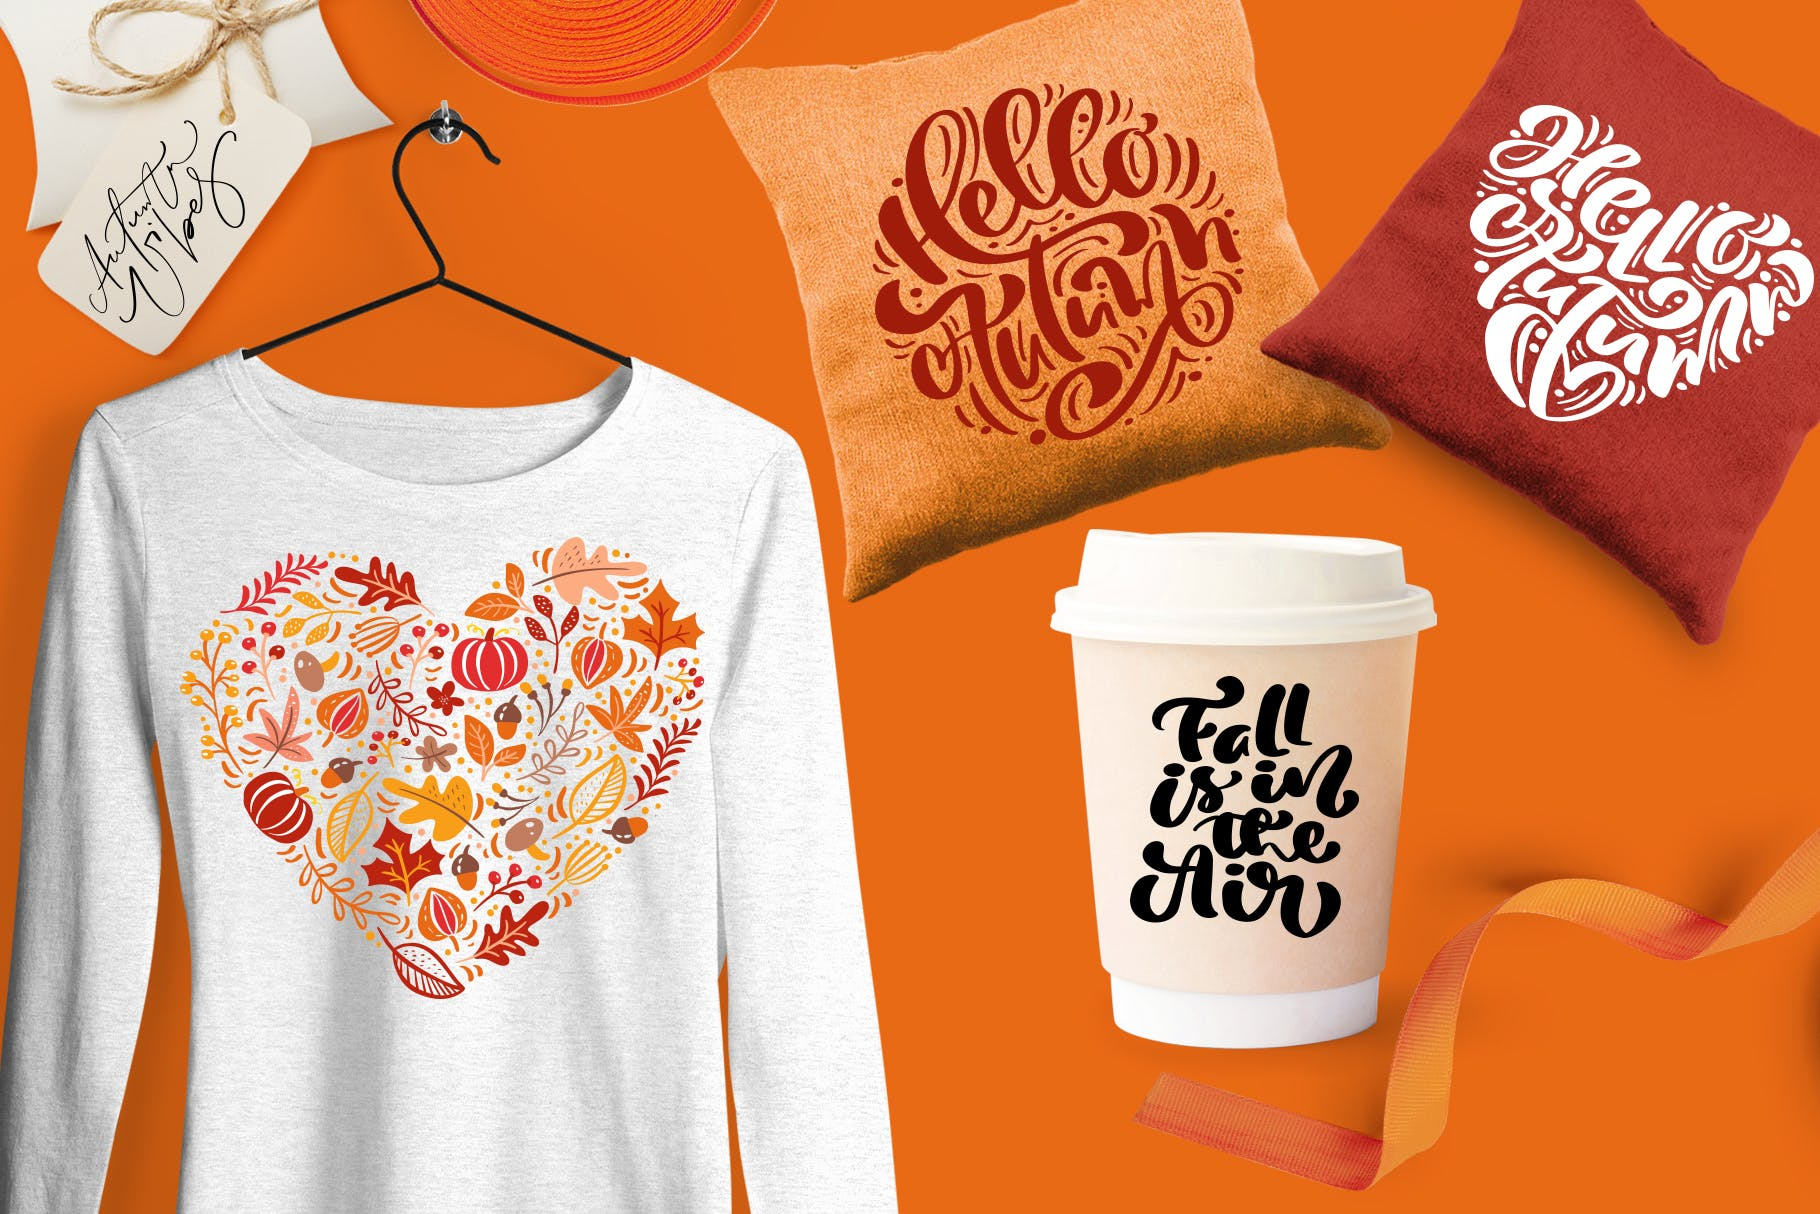 矢量书法和花卉元素图案花纹素材Autumn vector calligraphy floral elements插图(10)